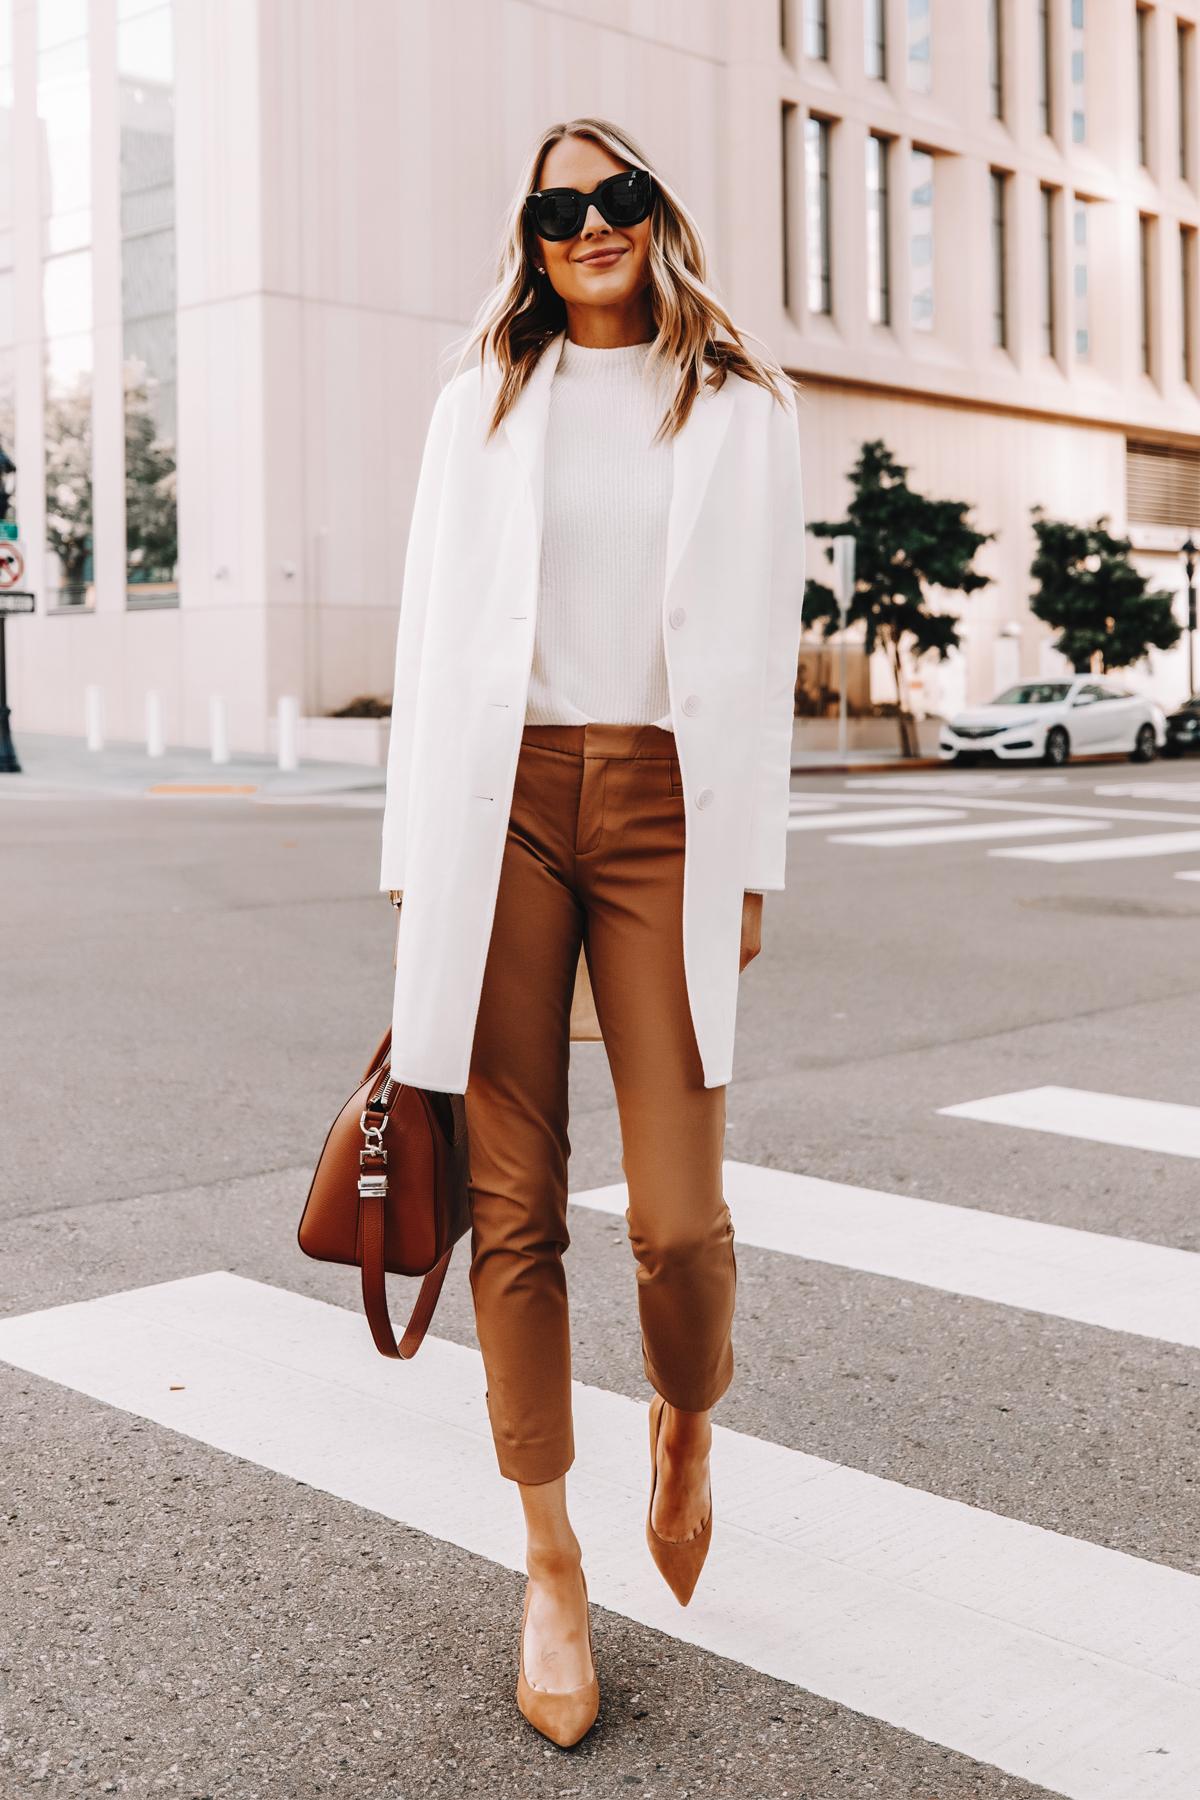 Fashion Jackson Wearing Banana Republic White Topcoat White Sweater Tan Trousers Tan Pumps Workwear Outfit